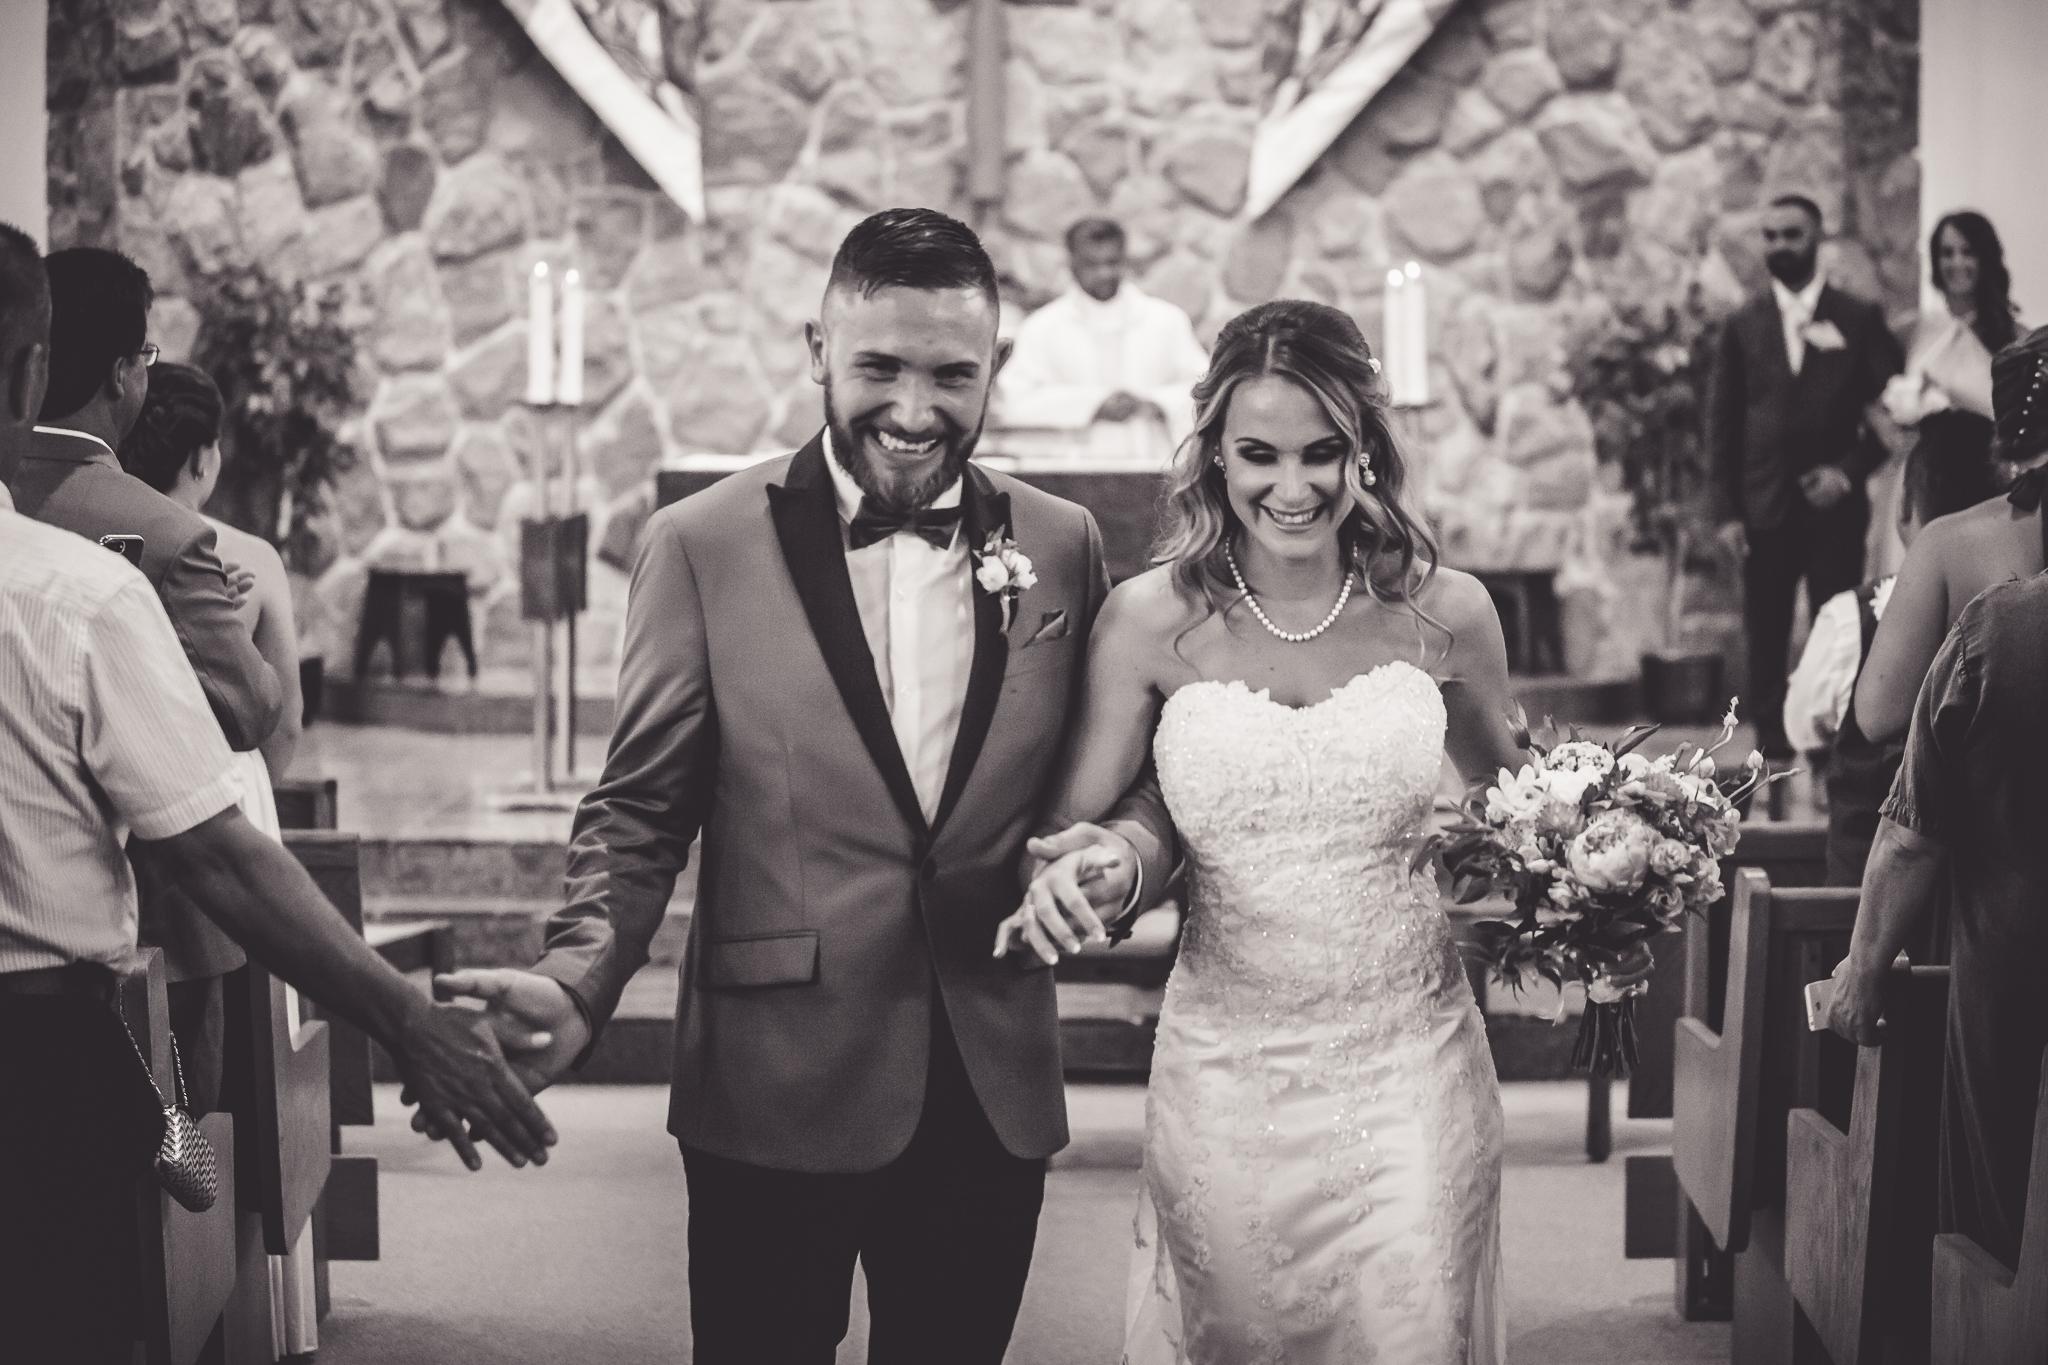 Amy D Photography- Wedding Ceremony- Muskoka Wedding Photography- Barrie Wedding Photography- Best Wedding Photographers 2018- Bride and Groom-53.jpg